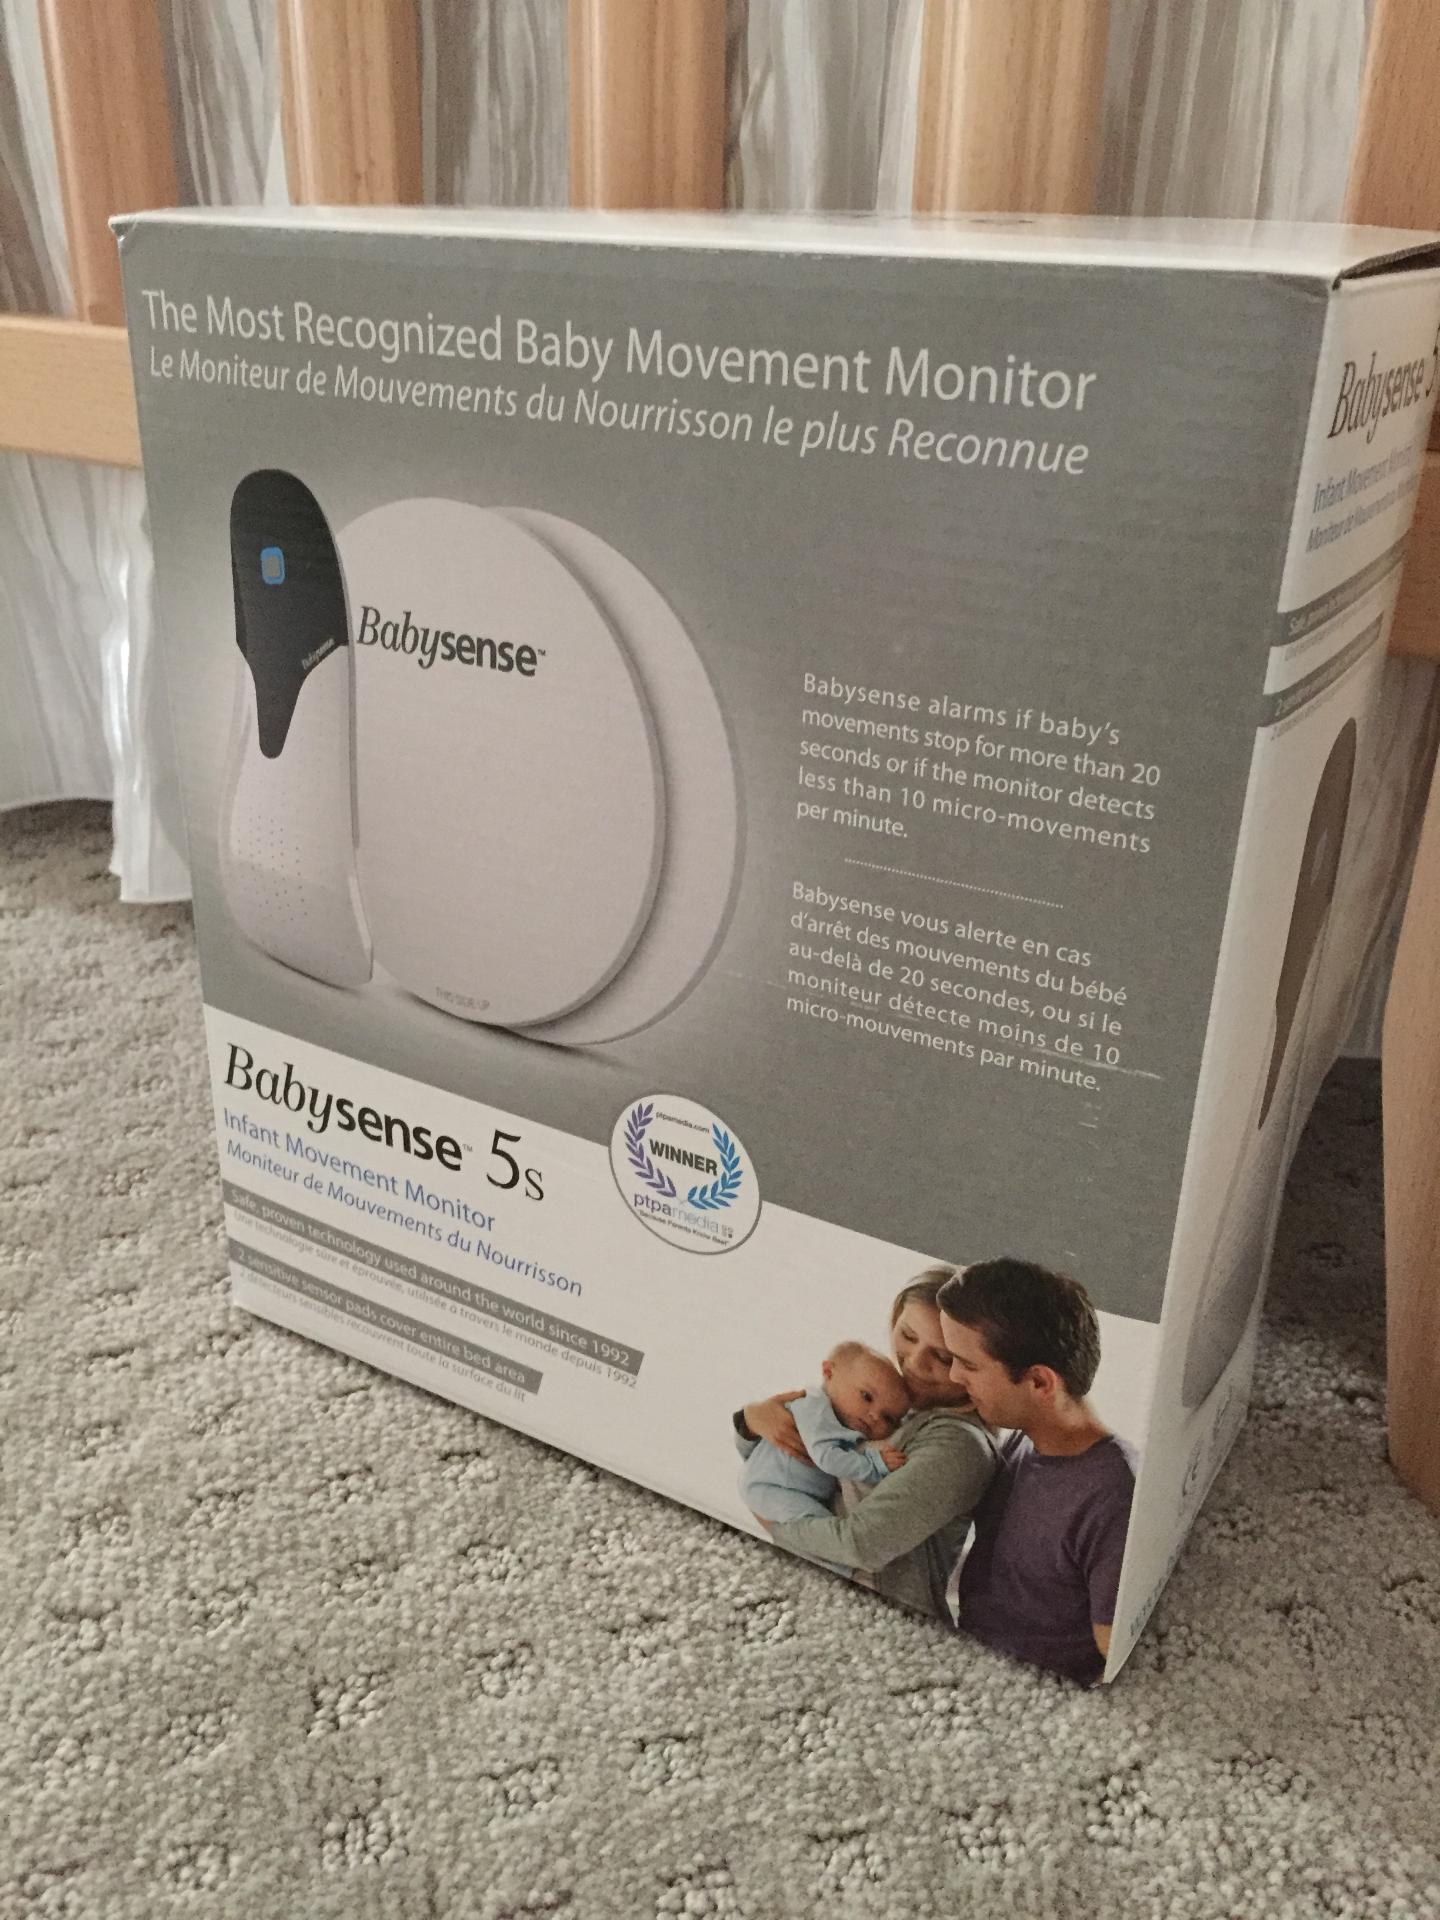 HiSense Infant Movement Monitor